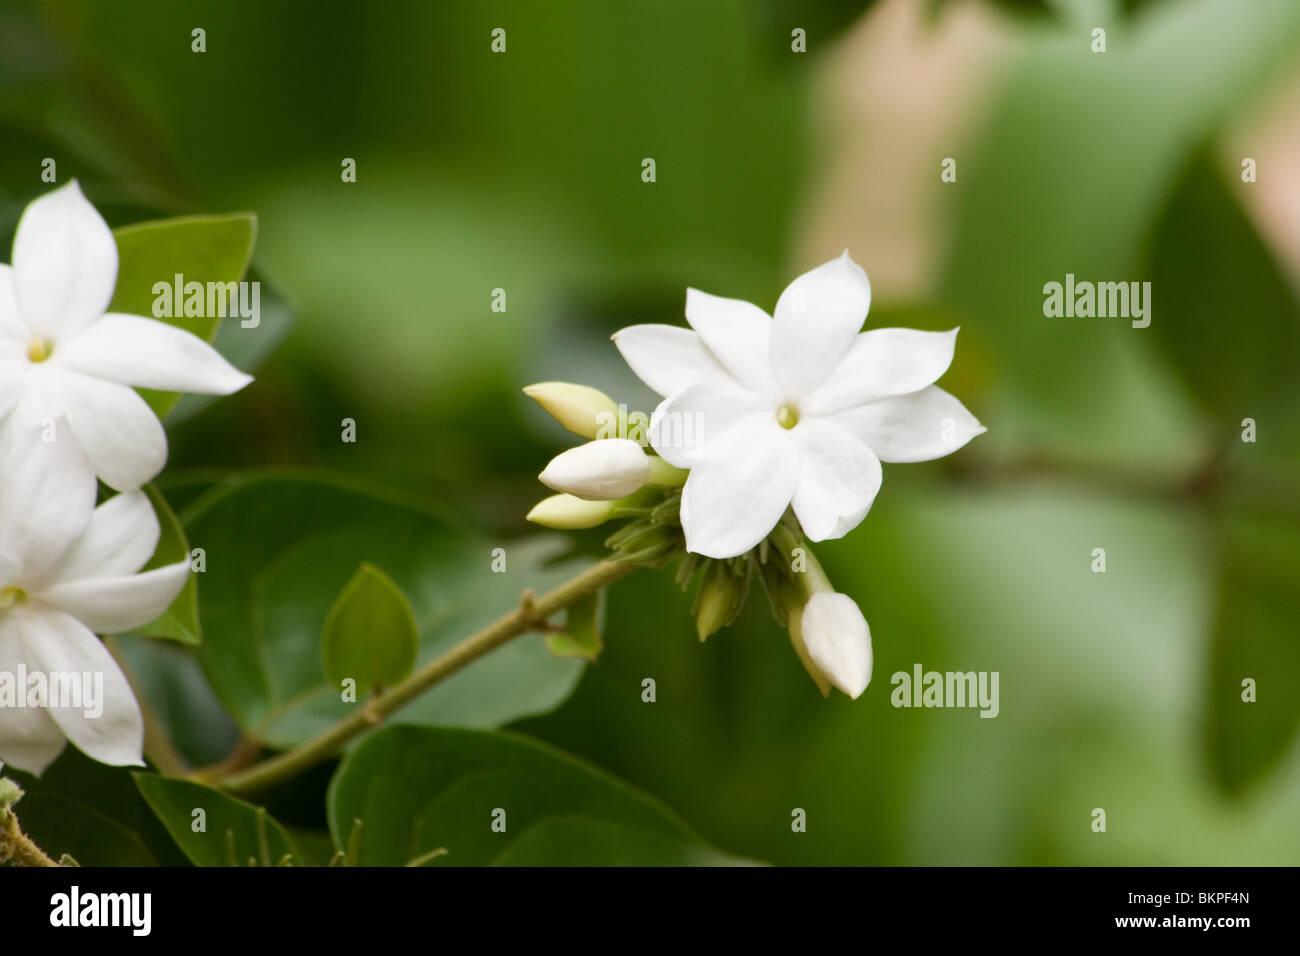 Jasmine flowers on the plant - Stock Image